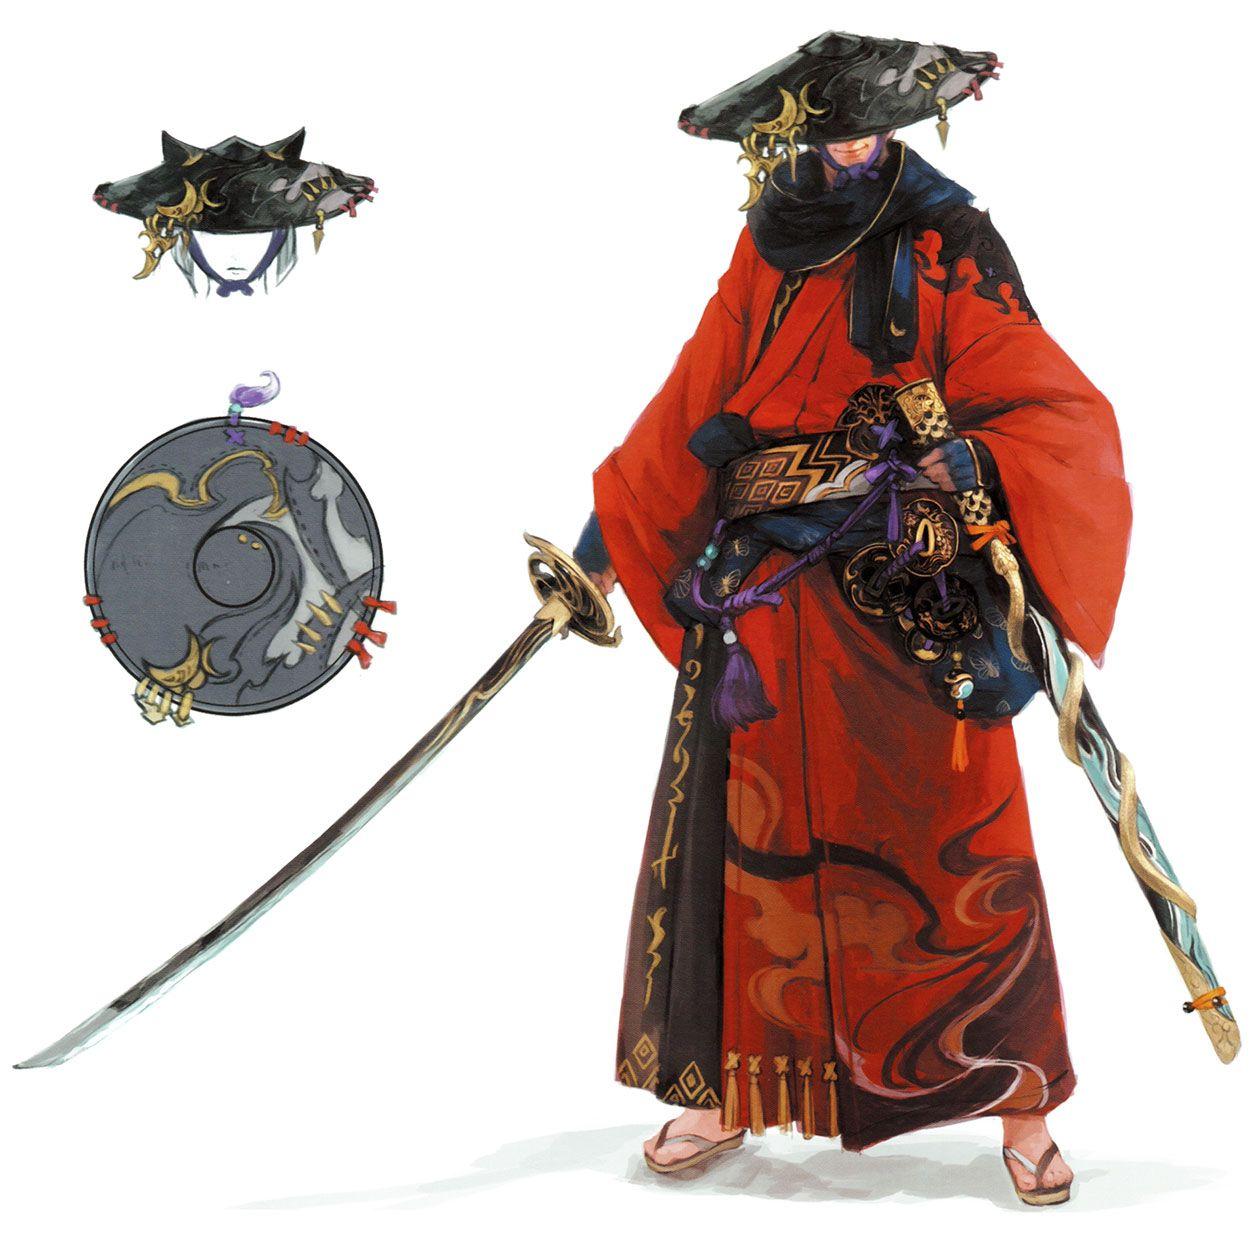 Samurai Amp Myochin Armor From Final Fantasy XIV Stormblood